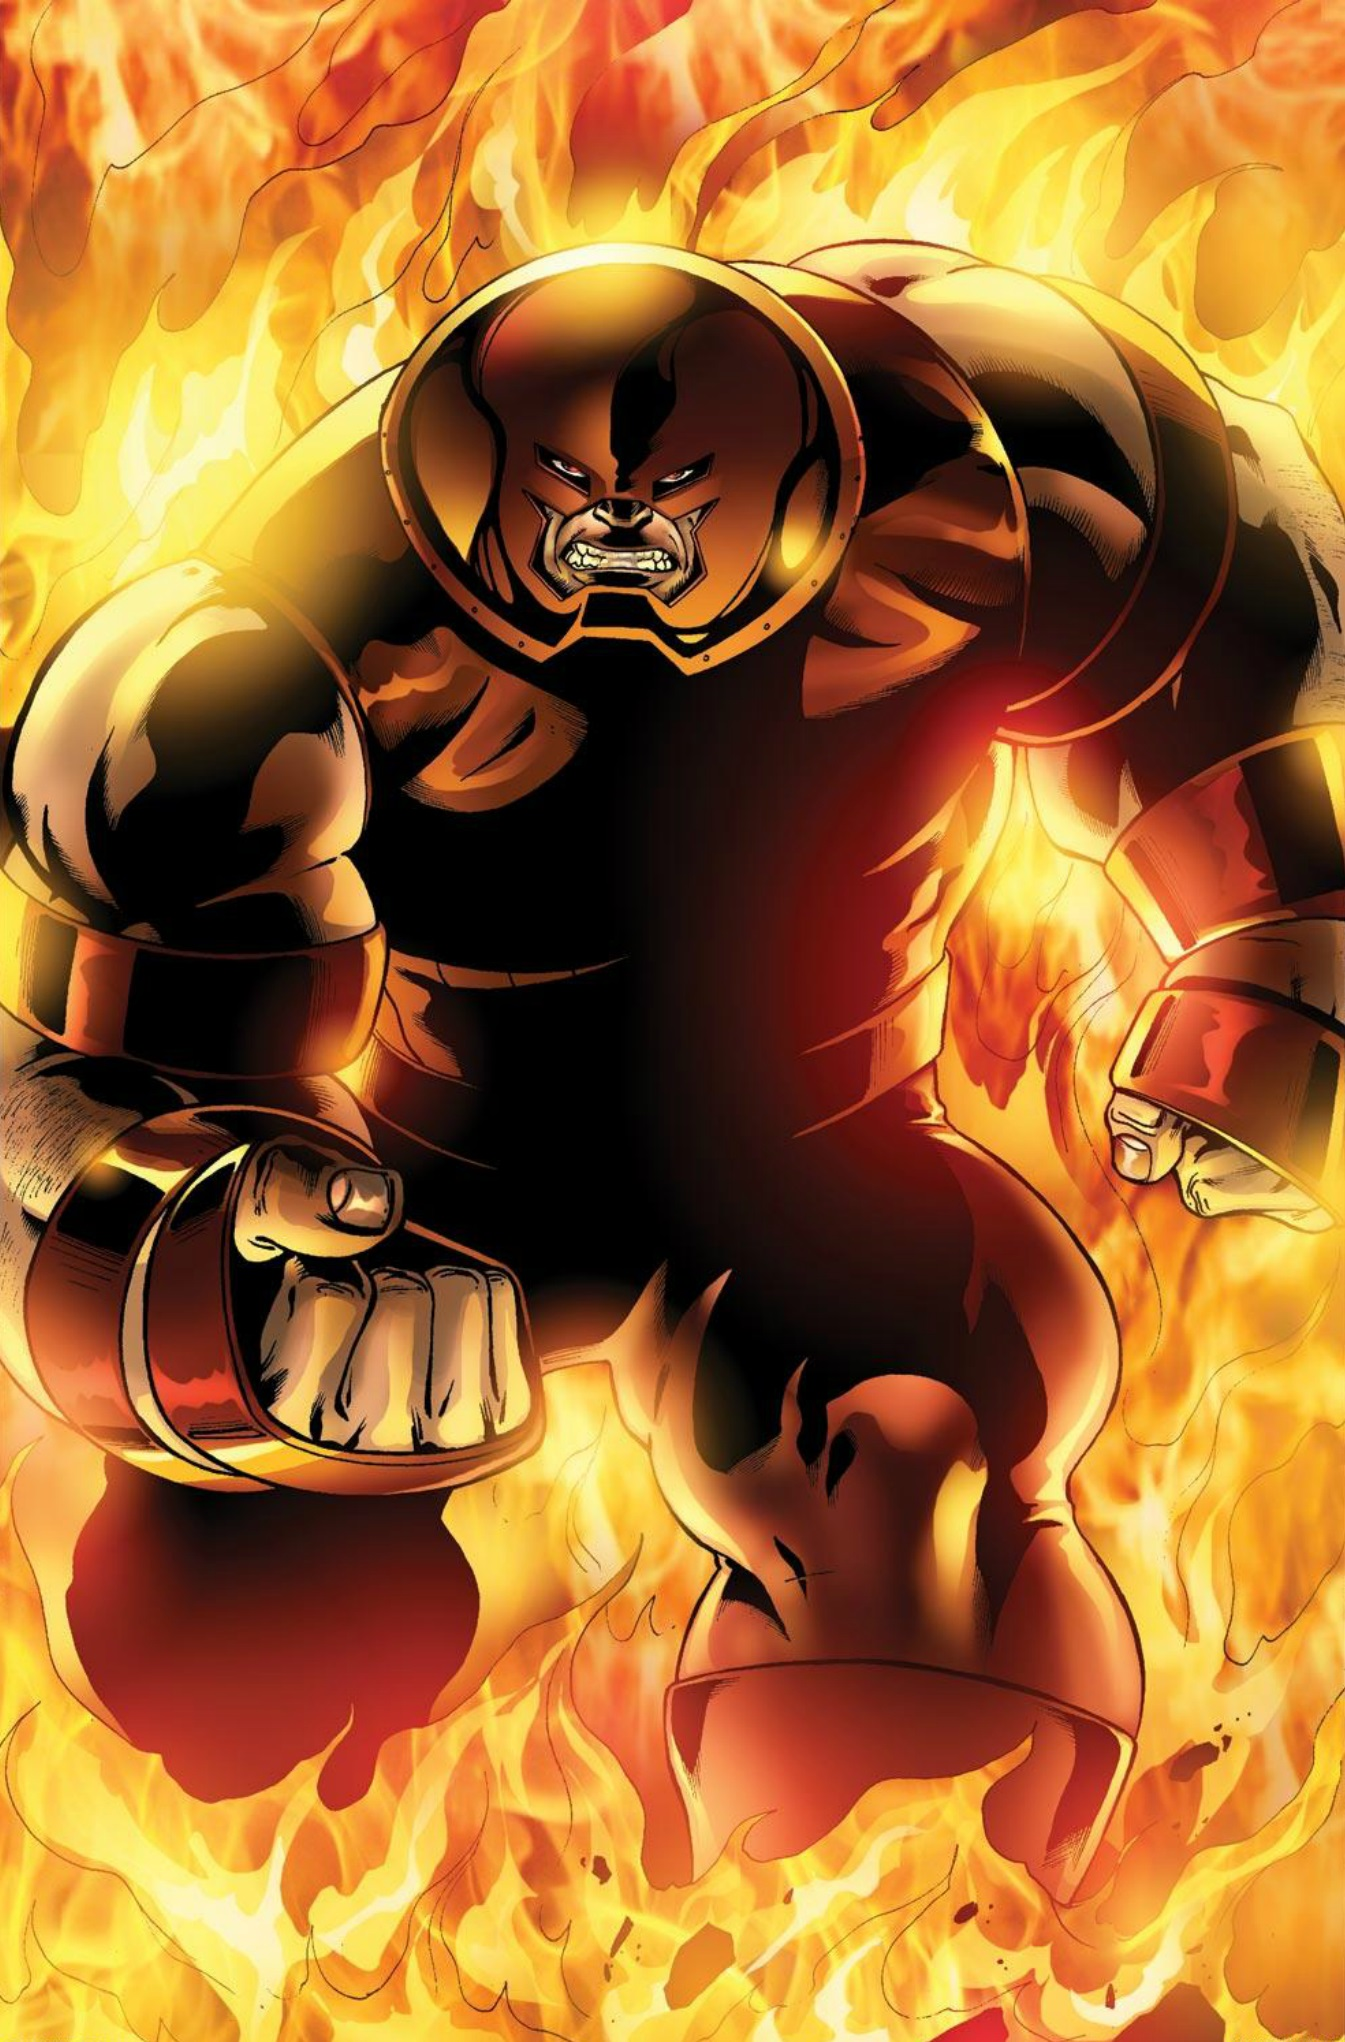 Juggernaut Villains Wiki Fandom Powered By Wikia